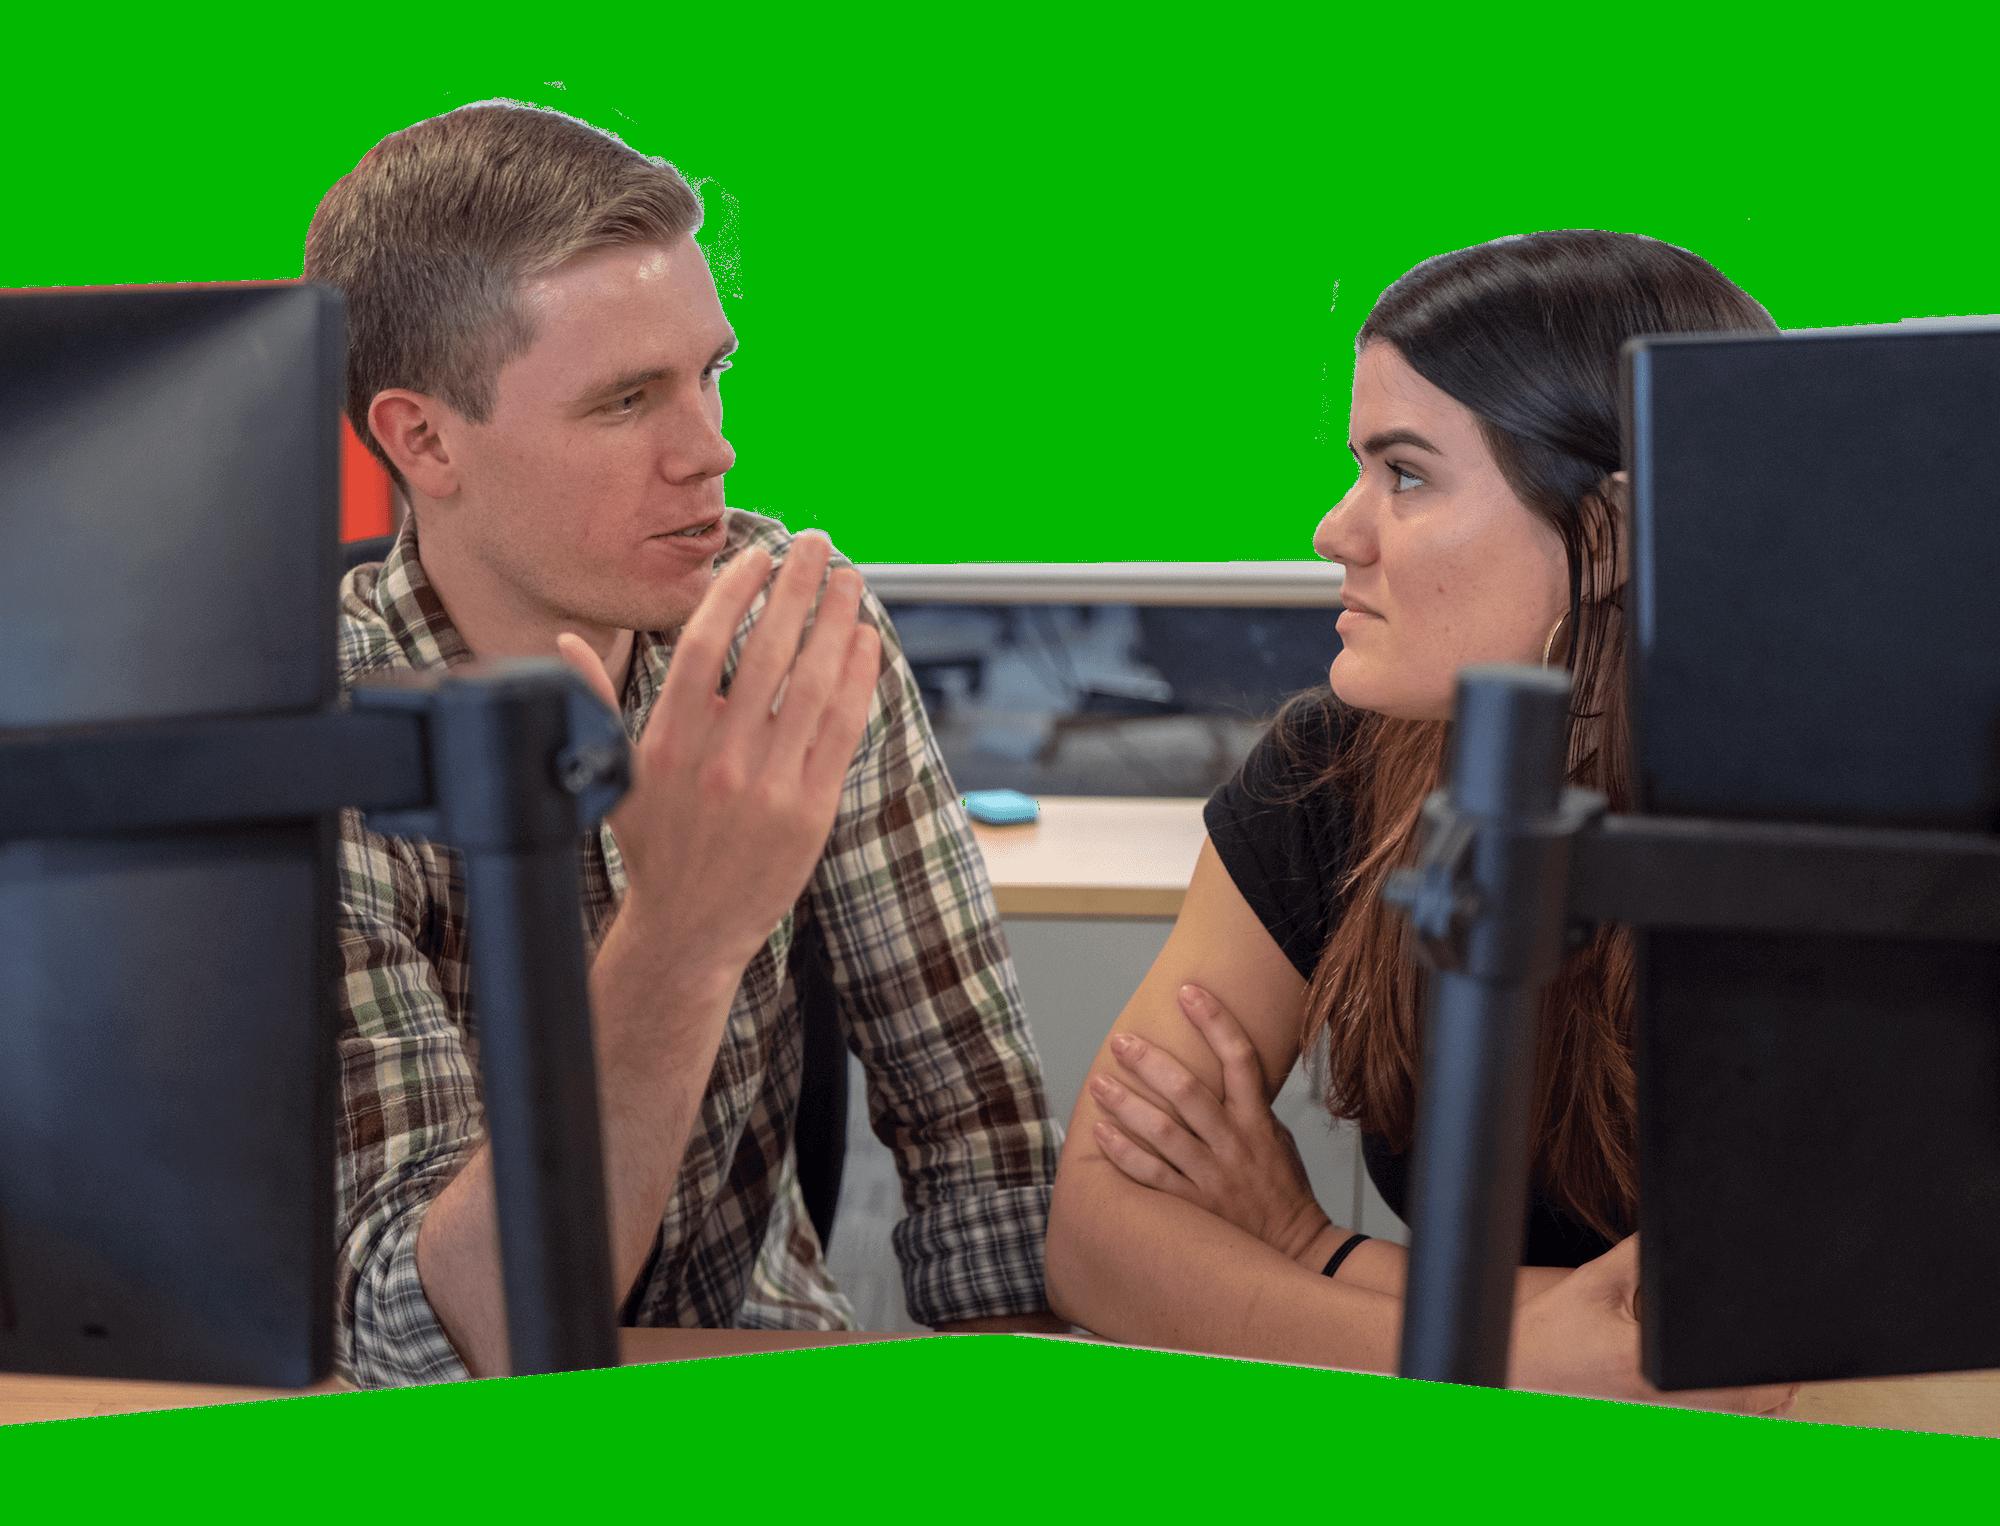 Man and woman talking behind computers